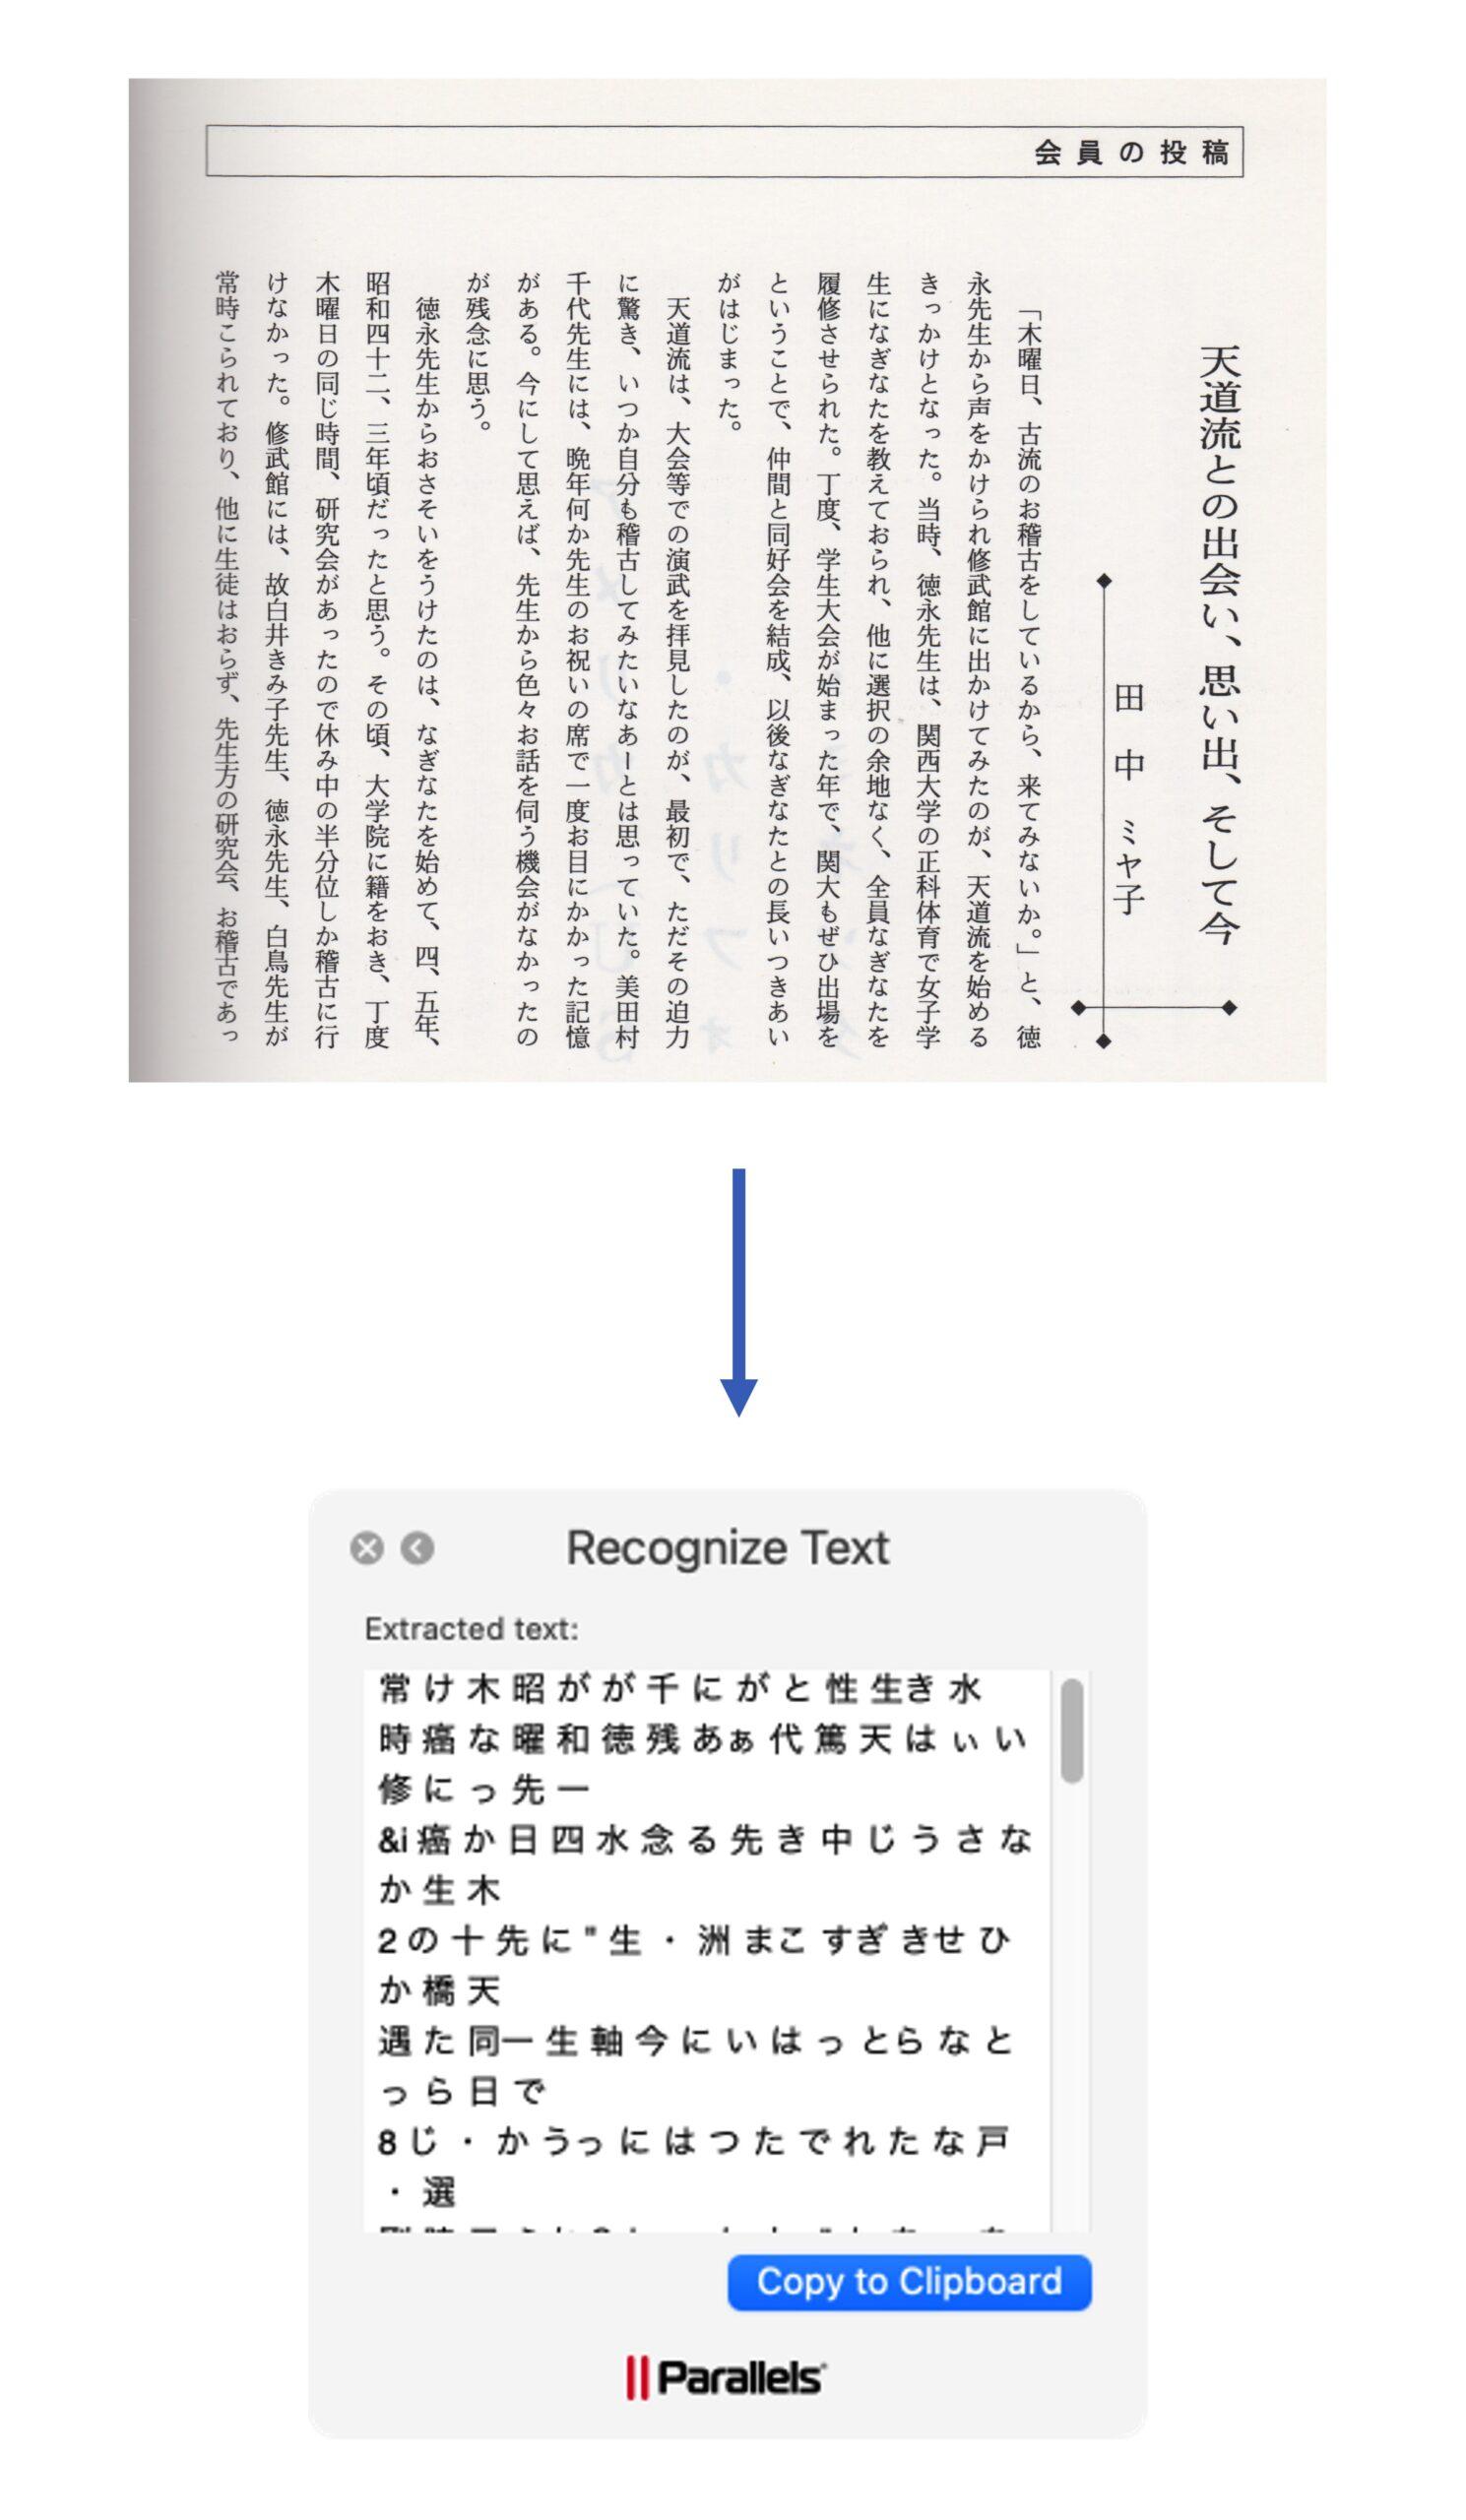 Recognize text Tool